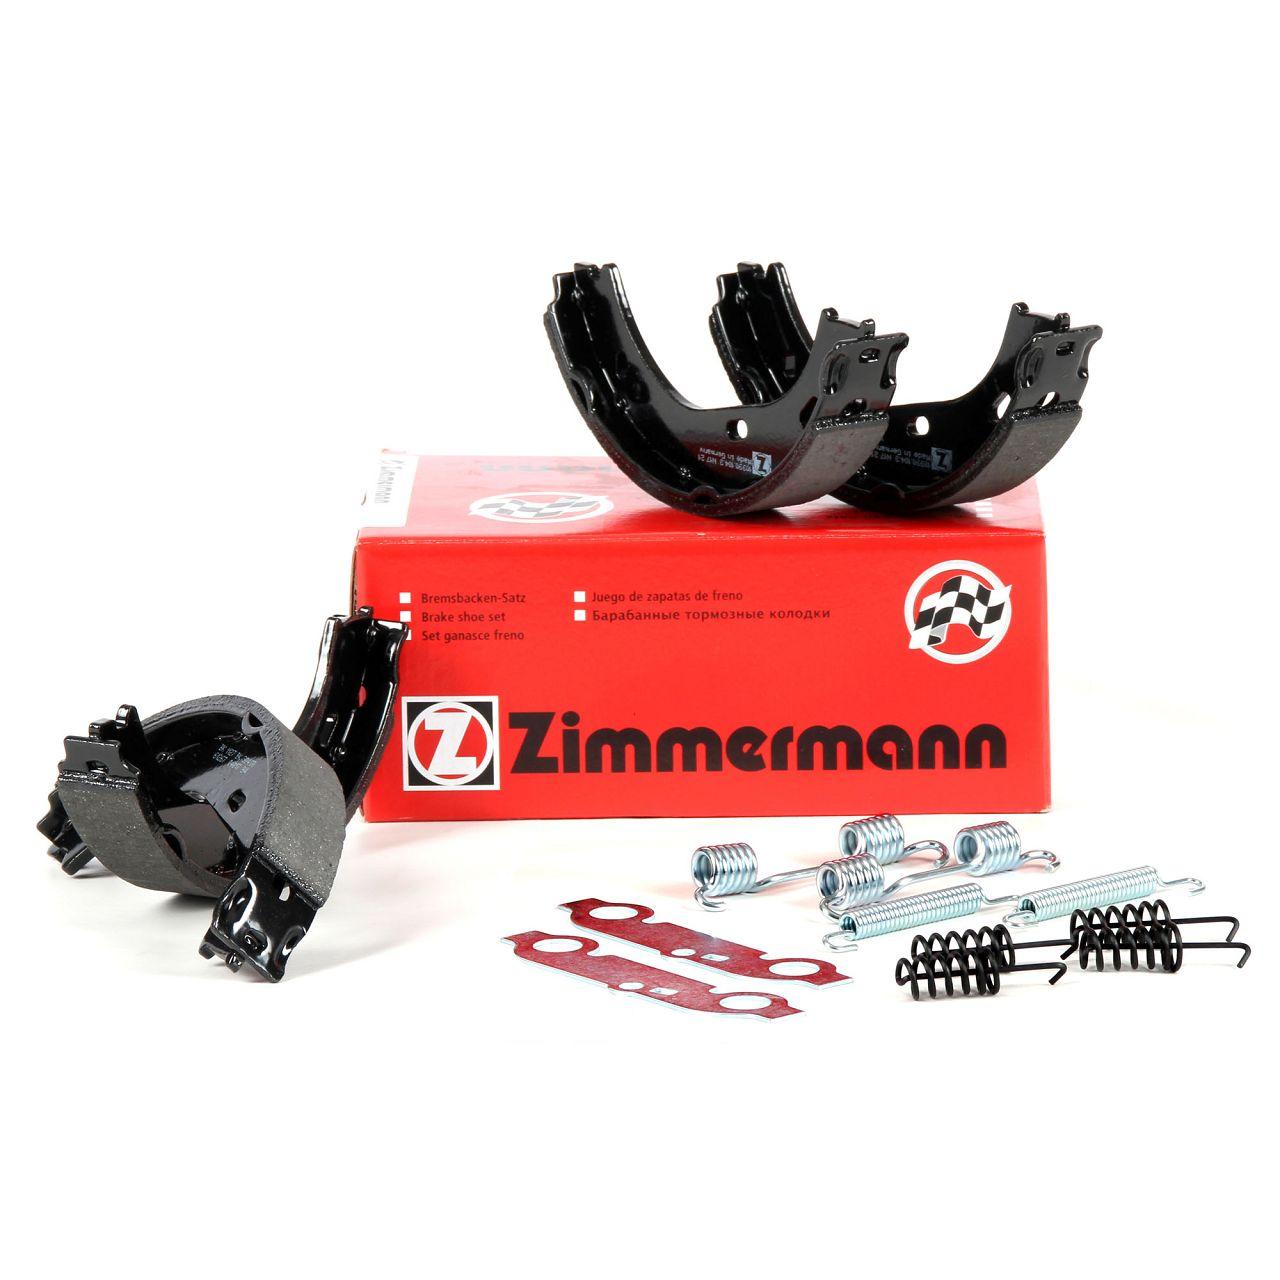 ZIMMERMANN Bremsbacken inkl. Federn für Mercedes W114 W115 W111 W123 W116 W126